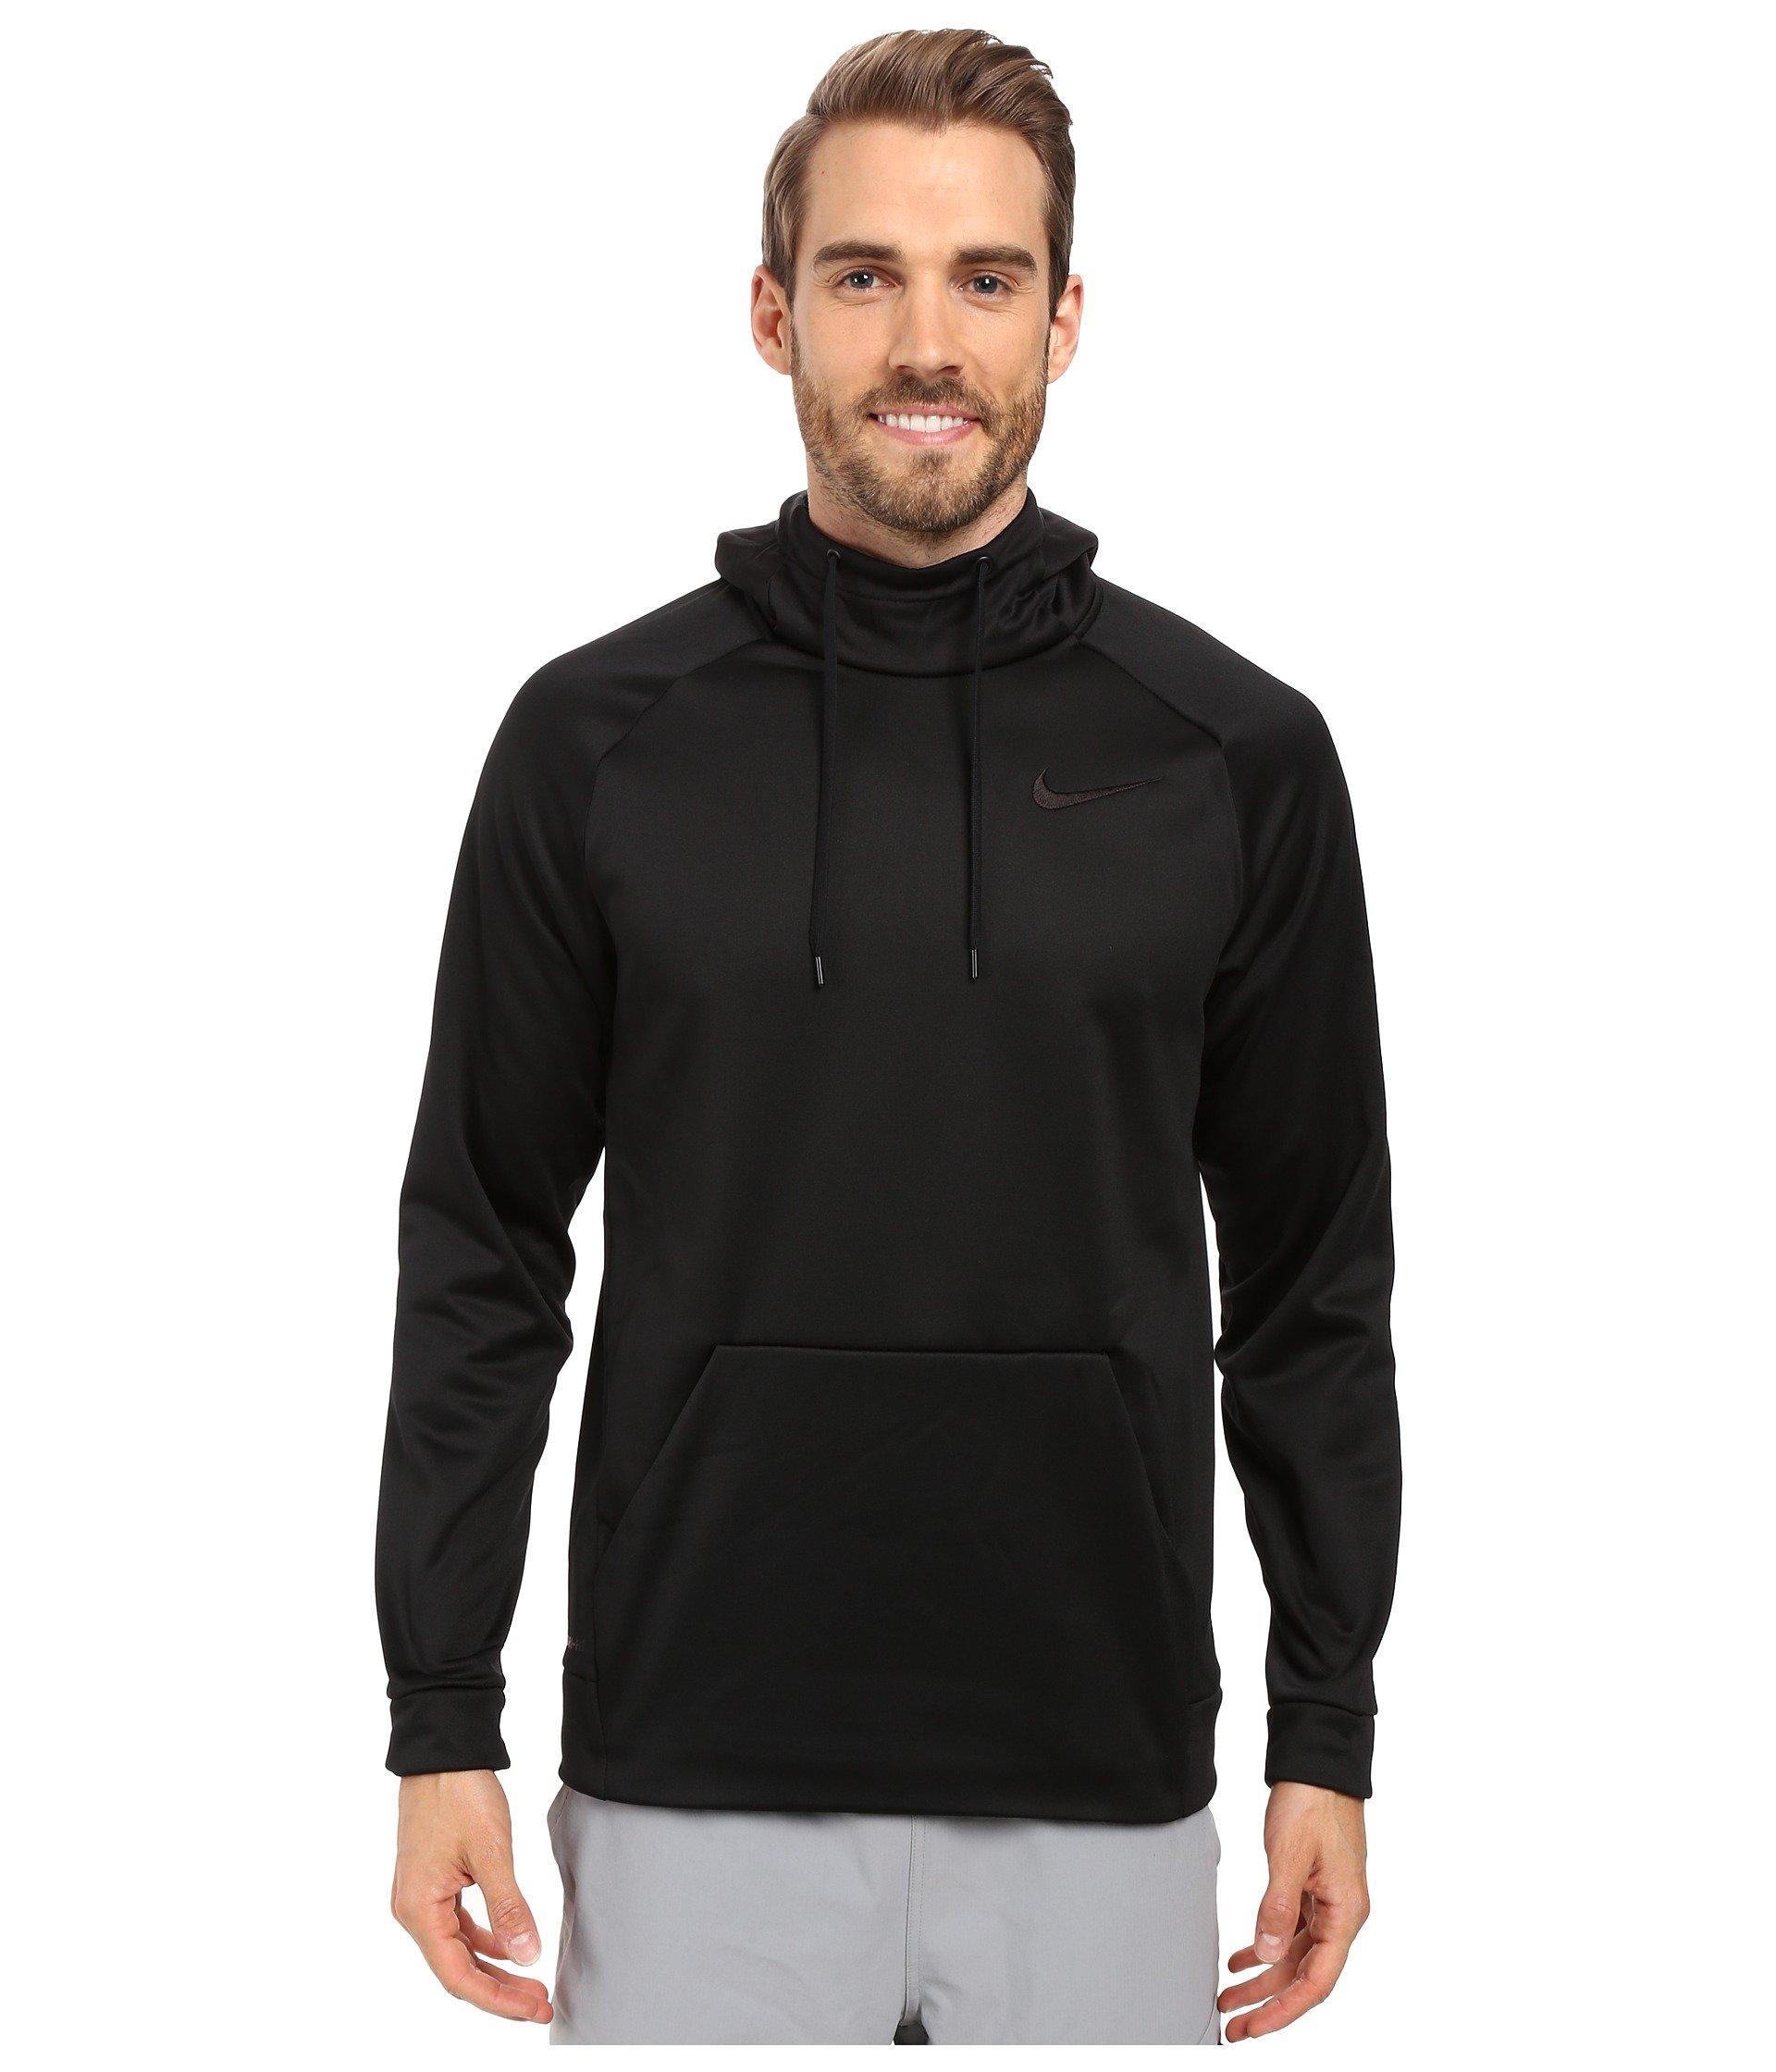 Nike Men's Therma Training Hoodie Black/Dark Grey Size XXX-Large by Nike